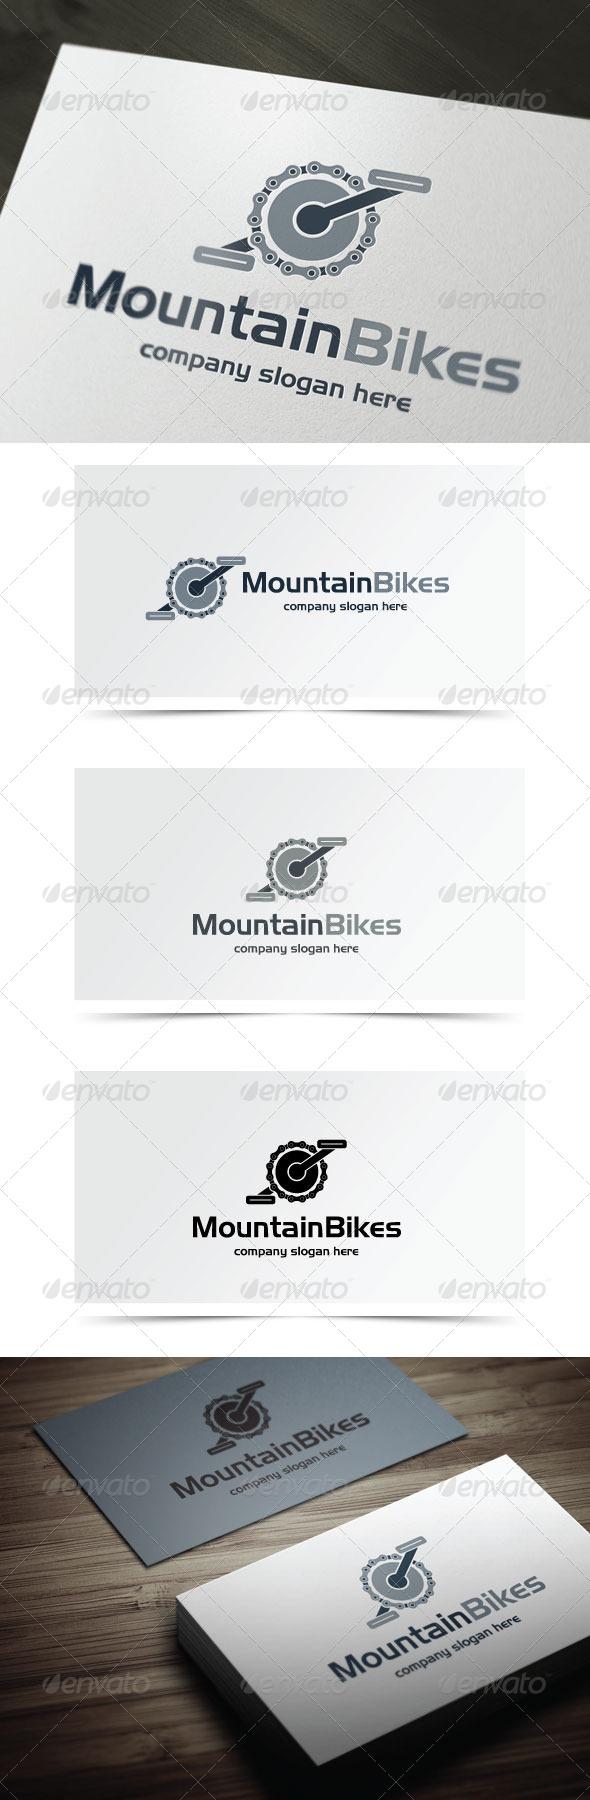 Mountain Bikes - Objects Logo Templates